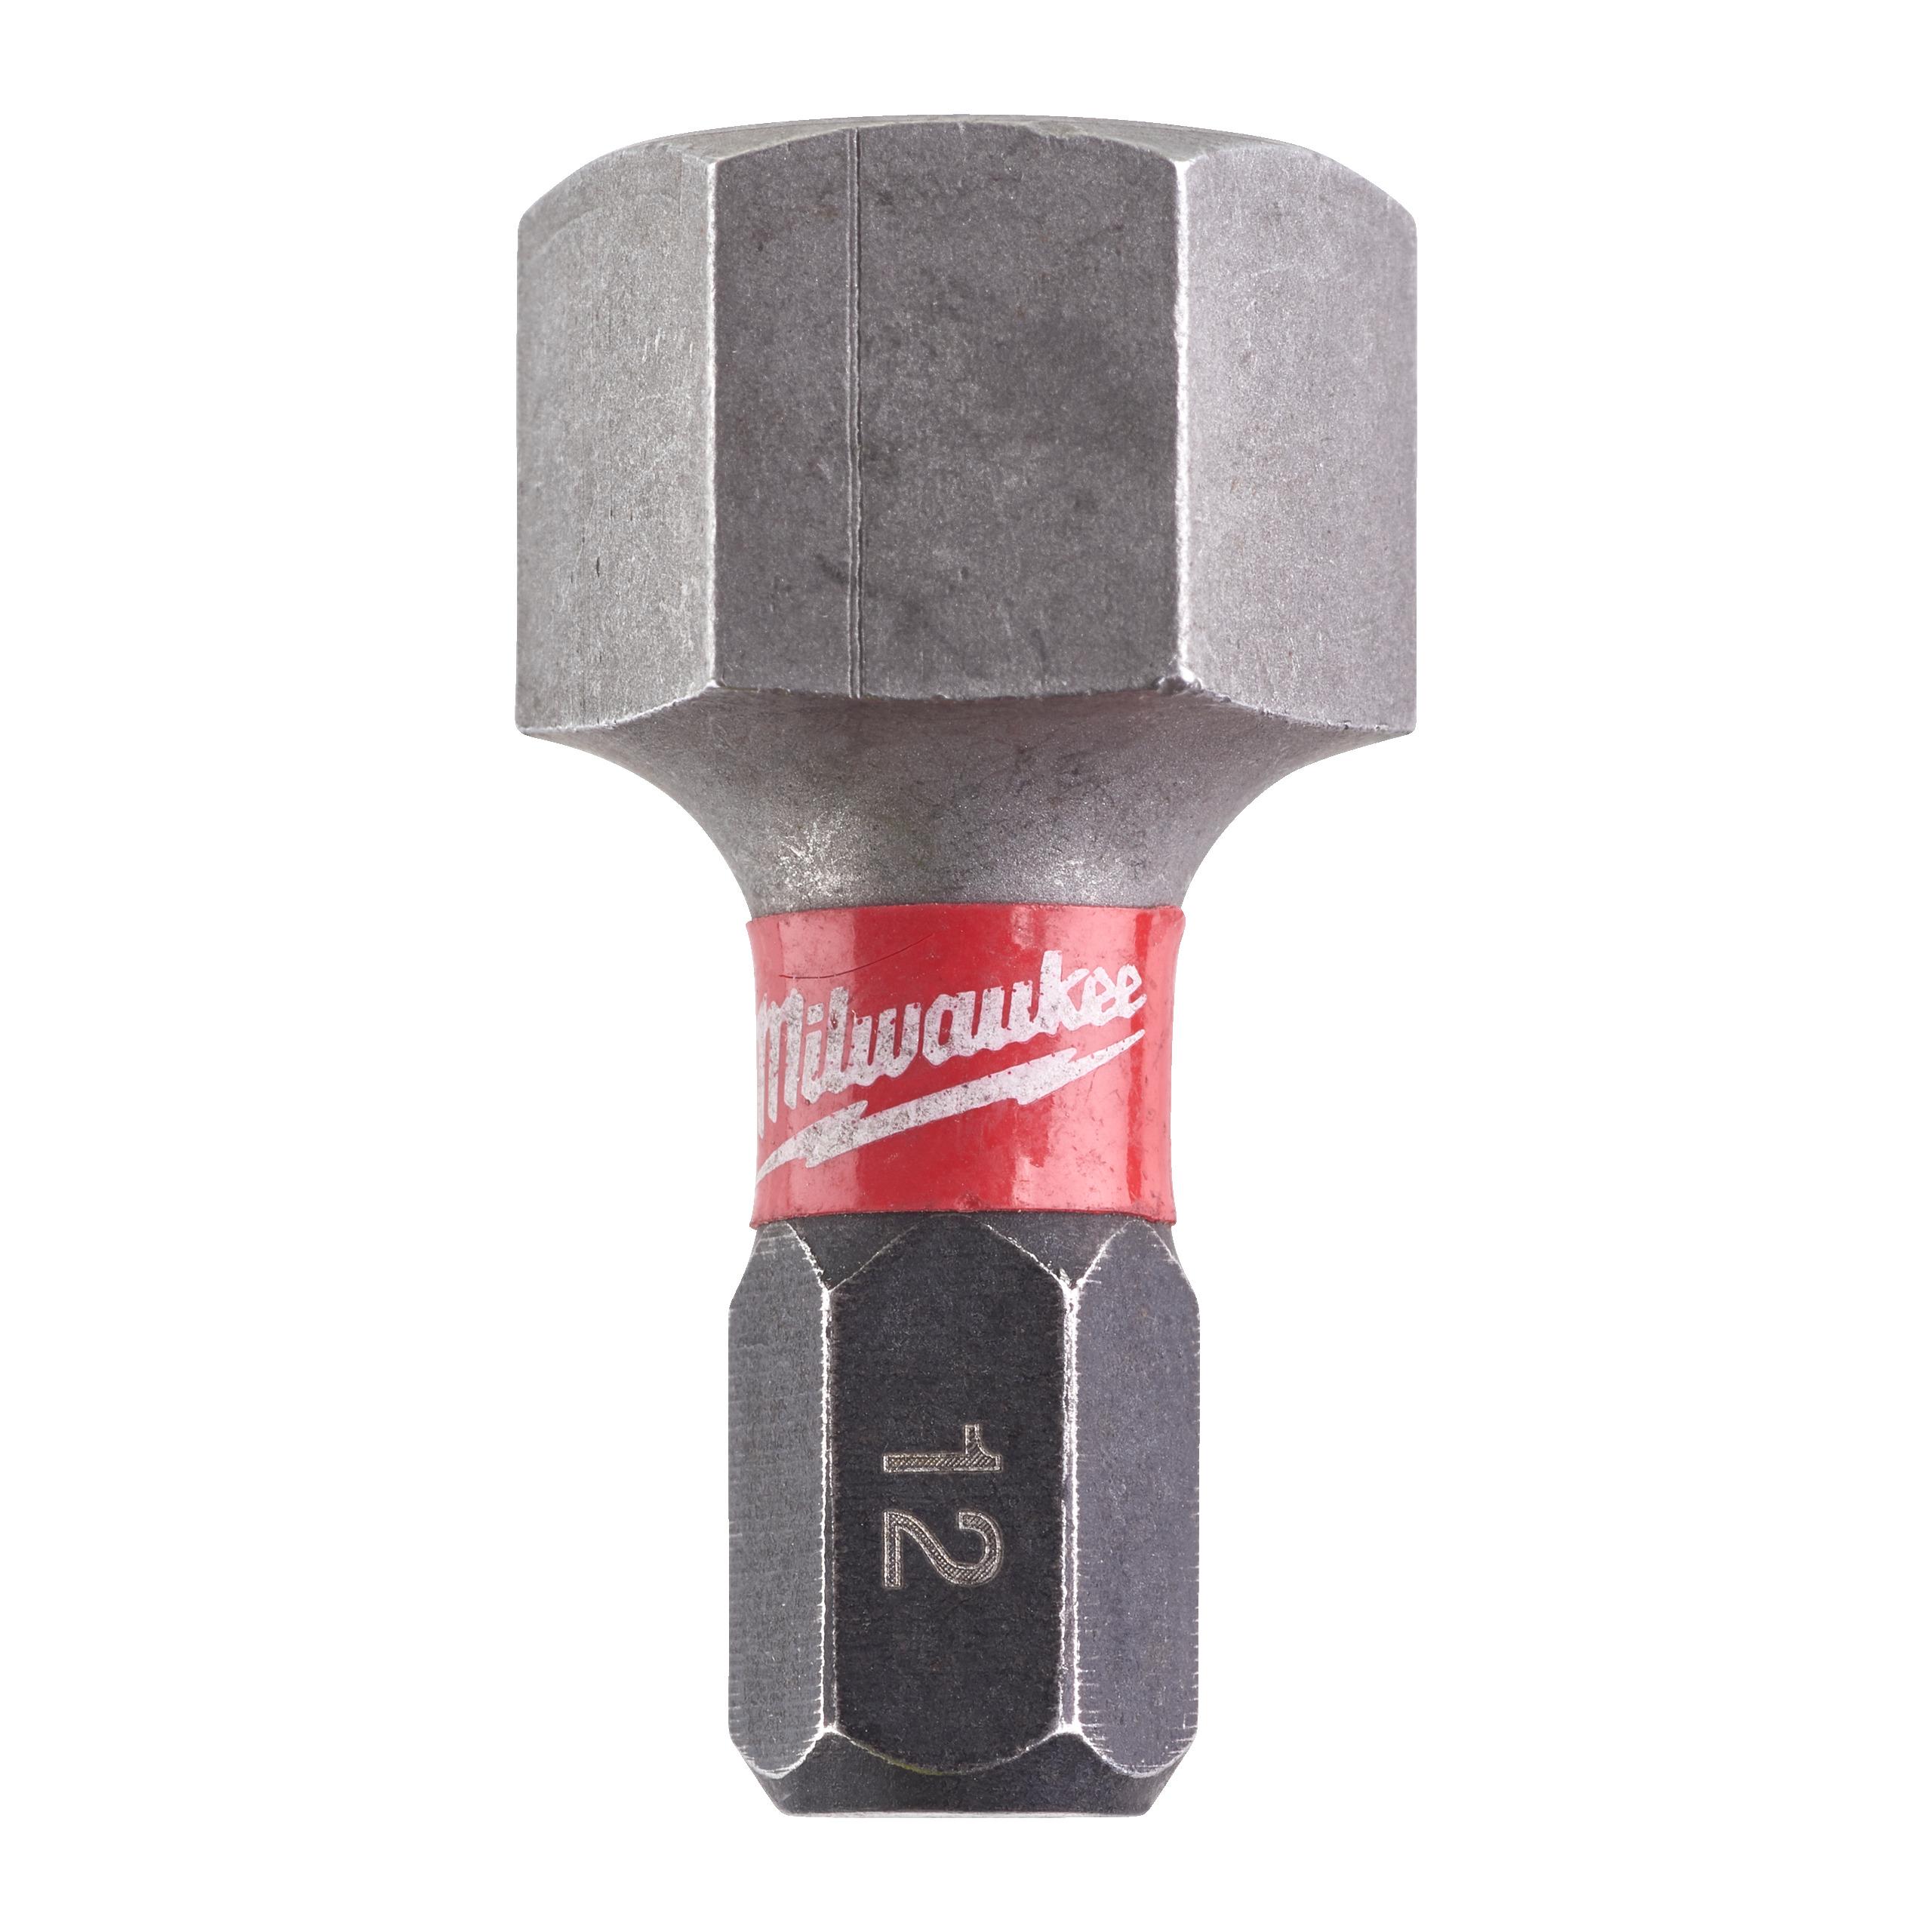 Šroubovací bity ShW Hex12 25mm - 2ks